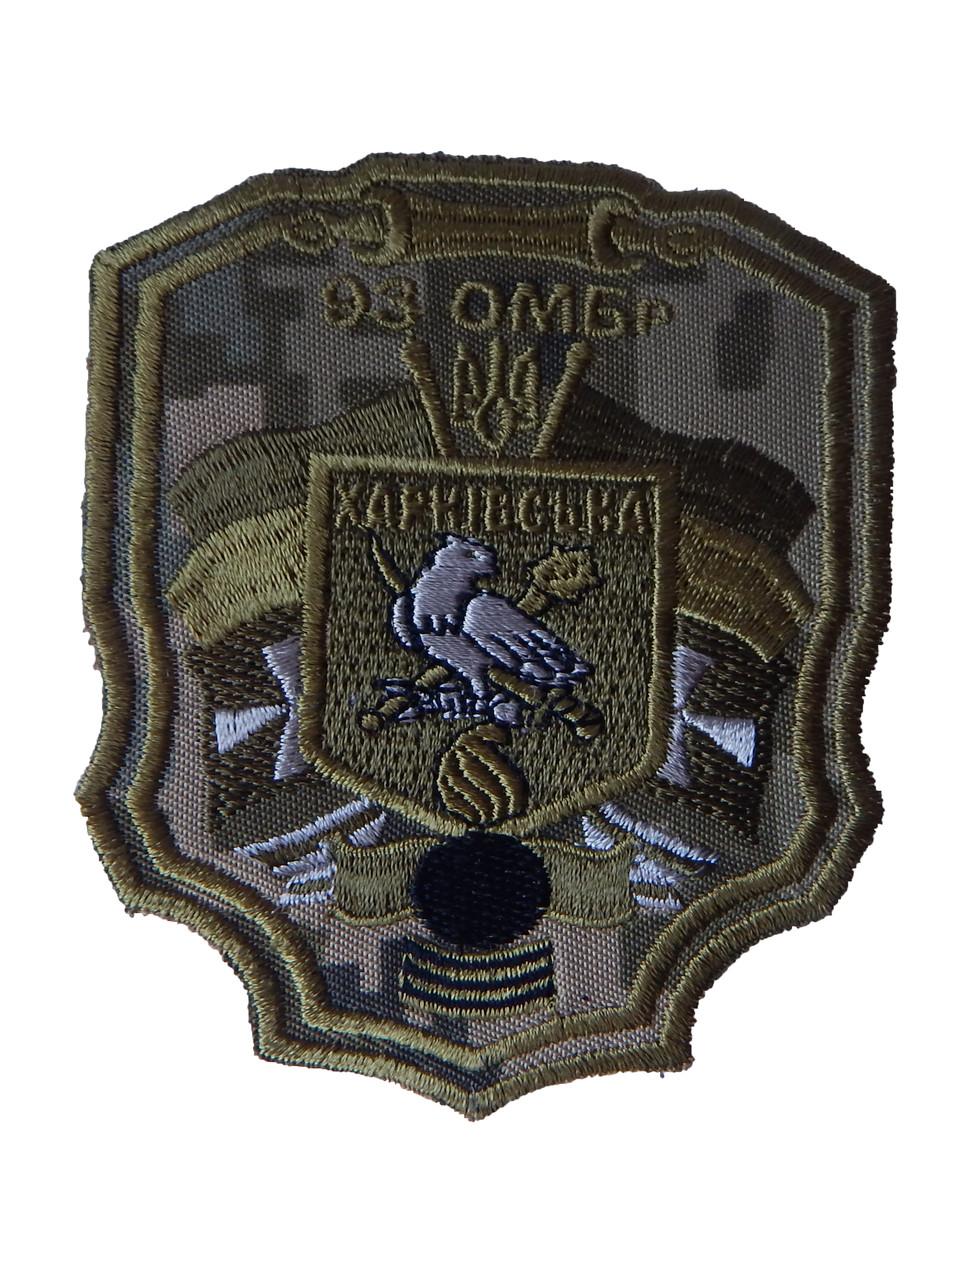 Шеврон 93 ОМБр пиксель ЗСУ  на липучке